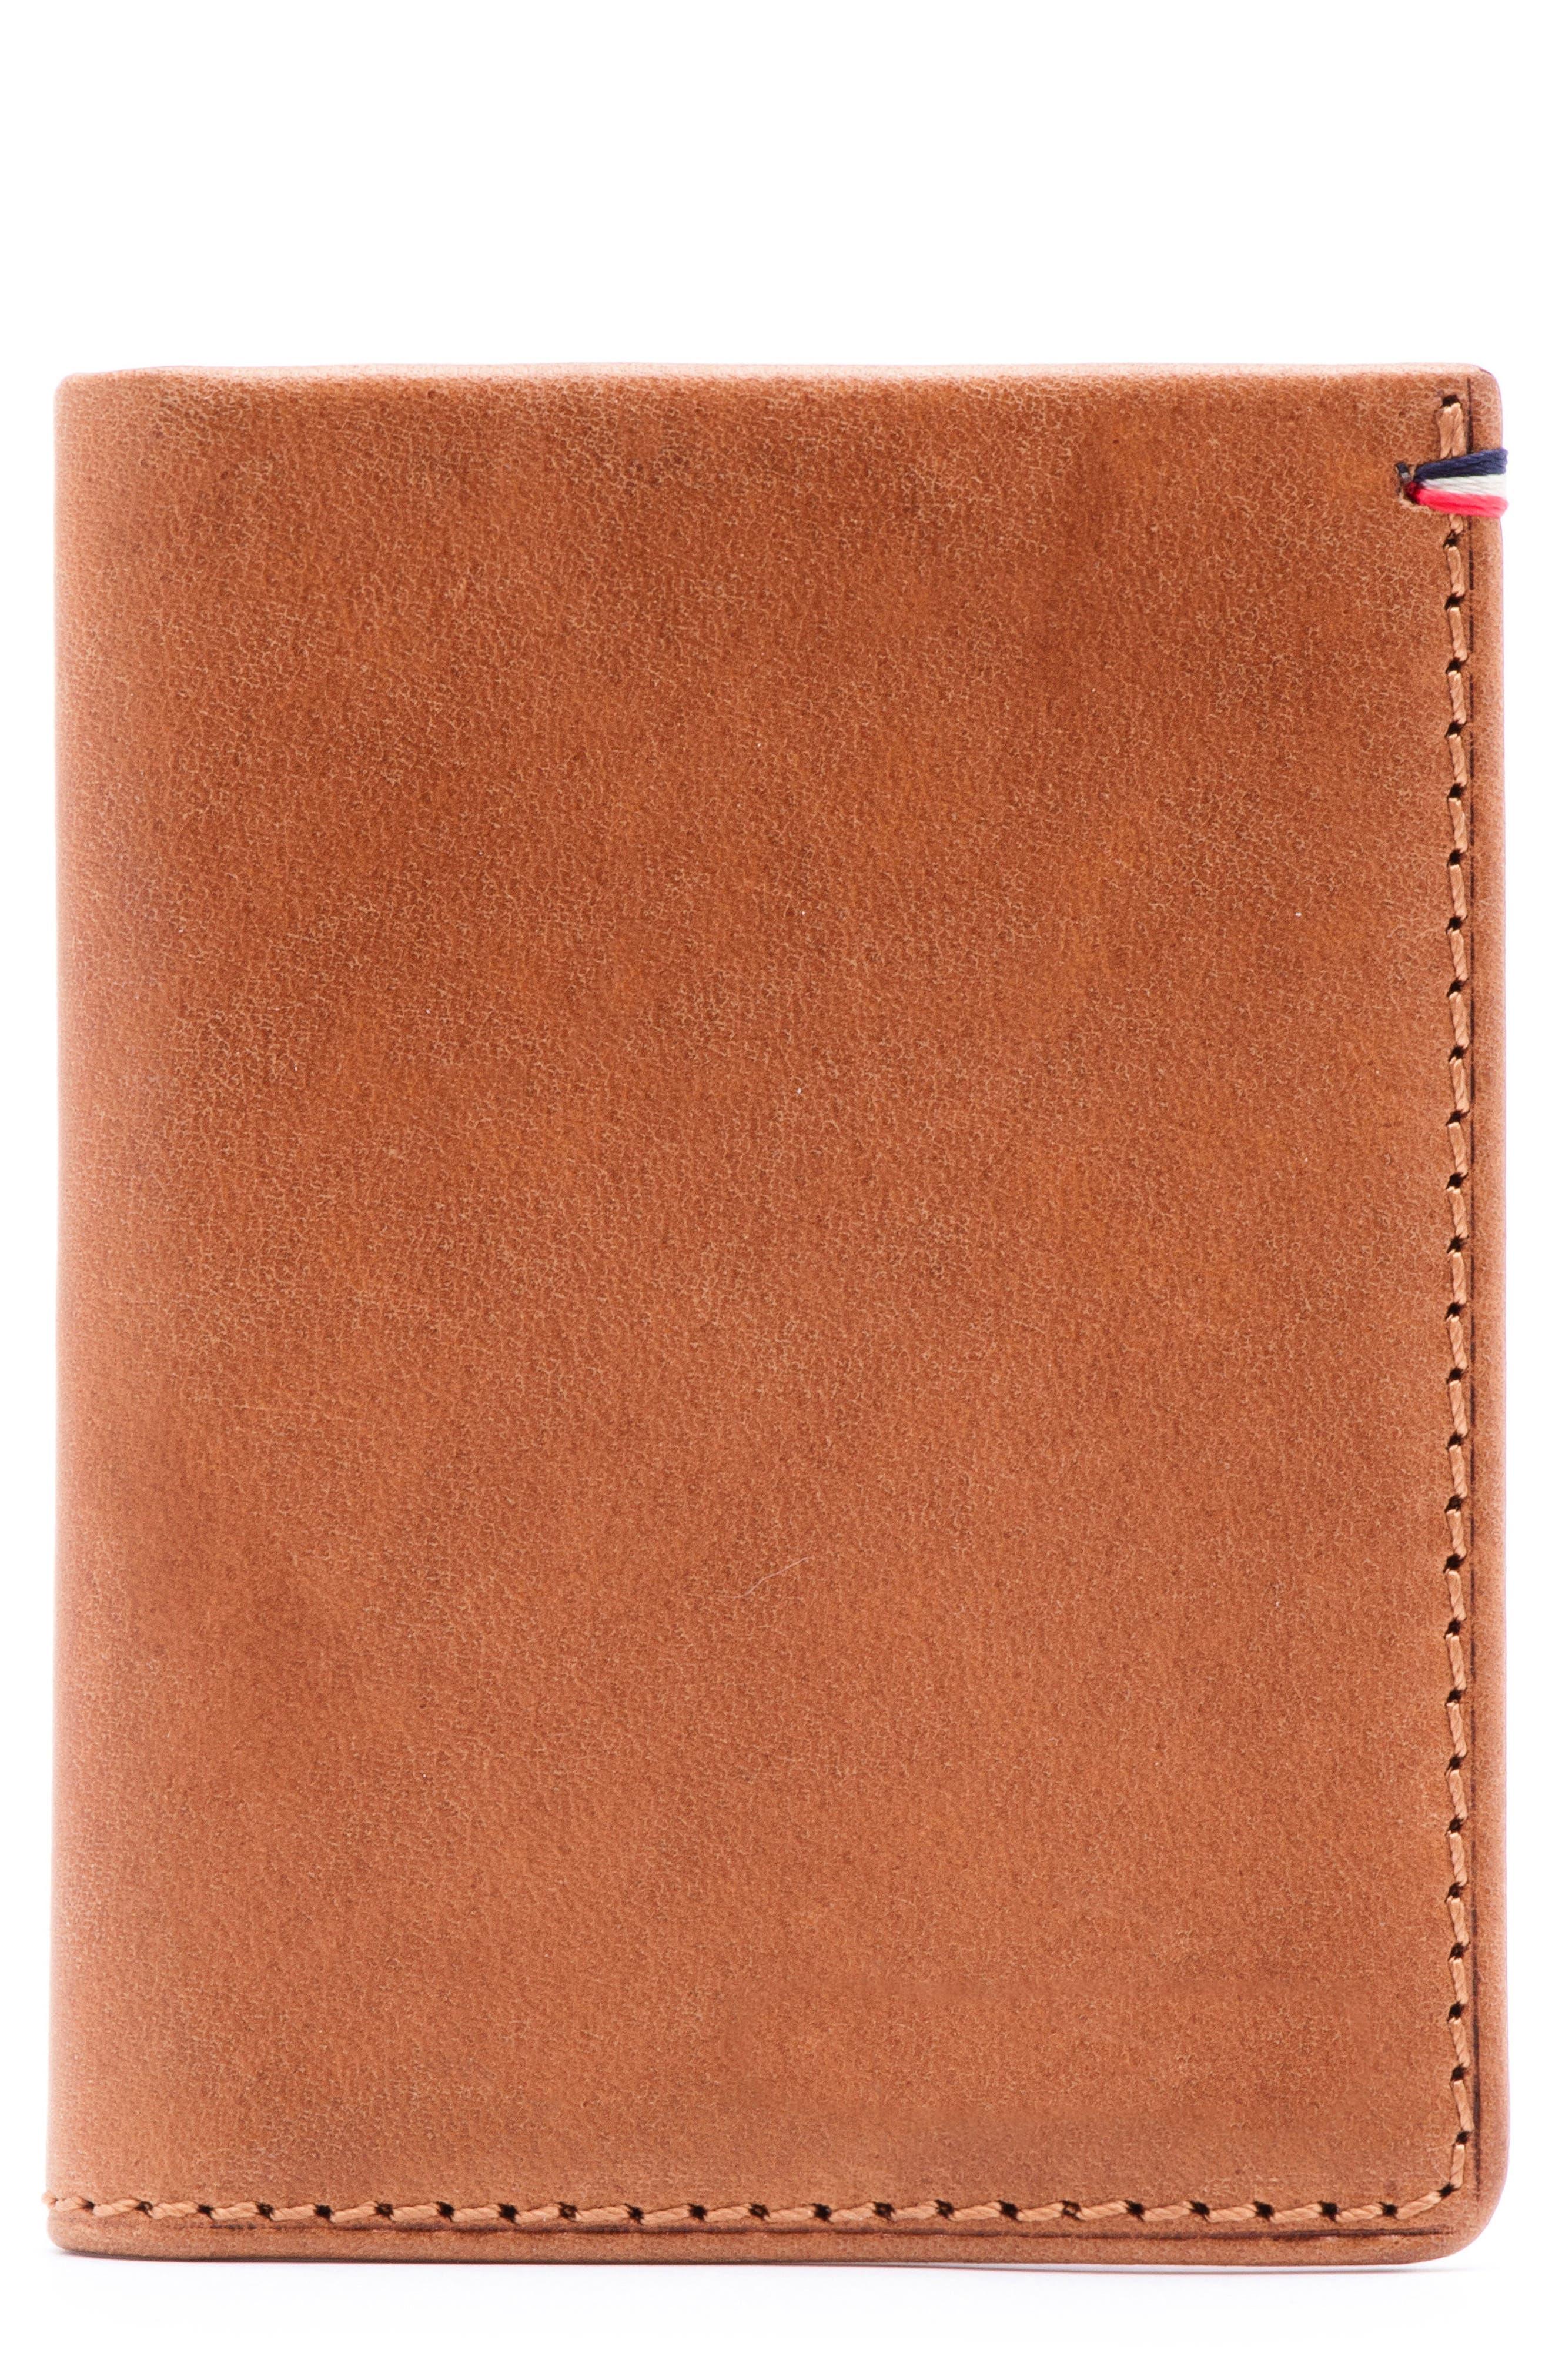 Jack Mason Core Leather Wallet